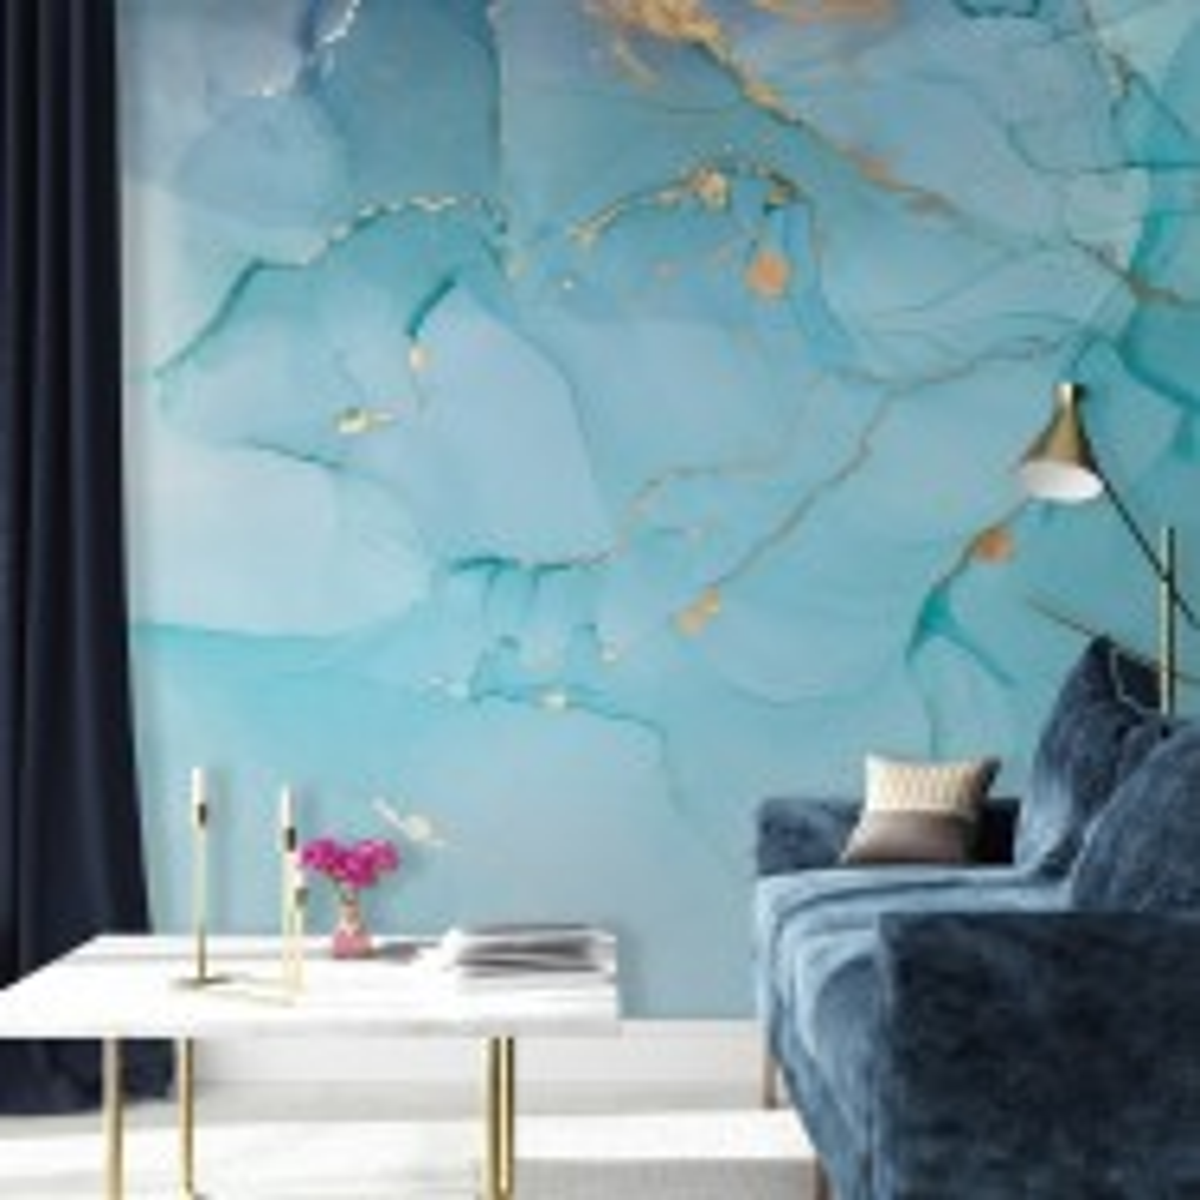 Light Blue Marble with Gold Splash Wallpaper Mural